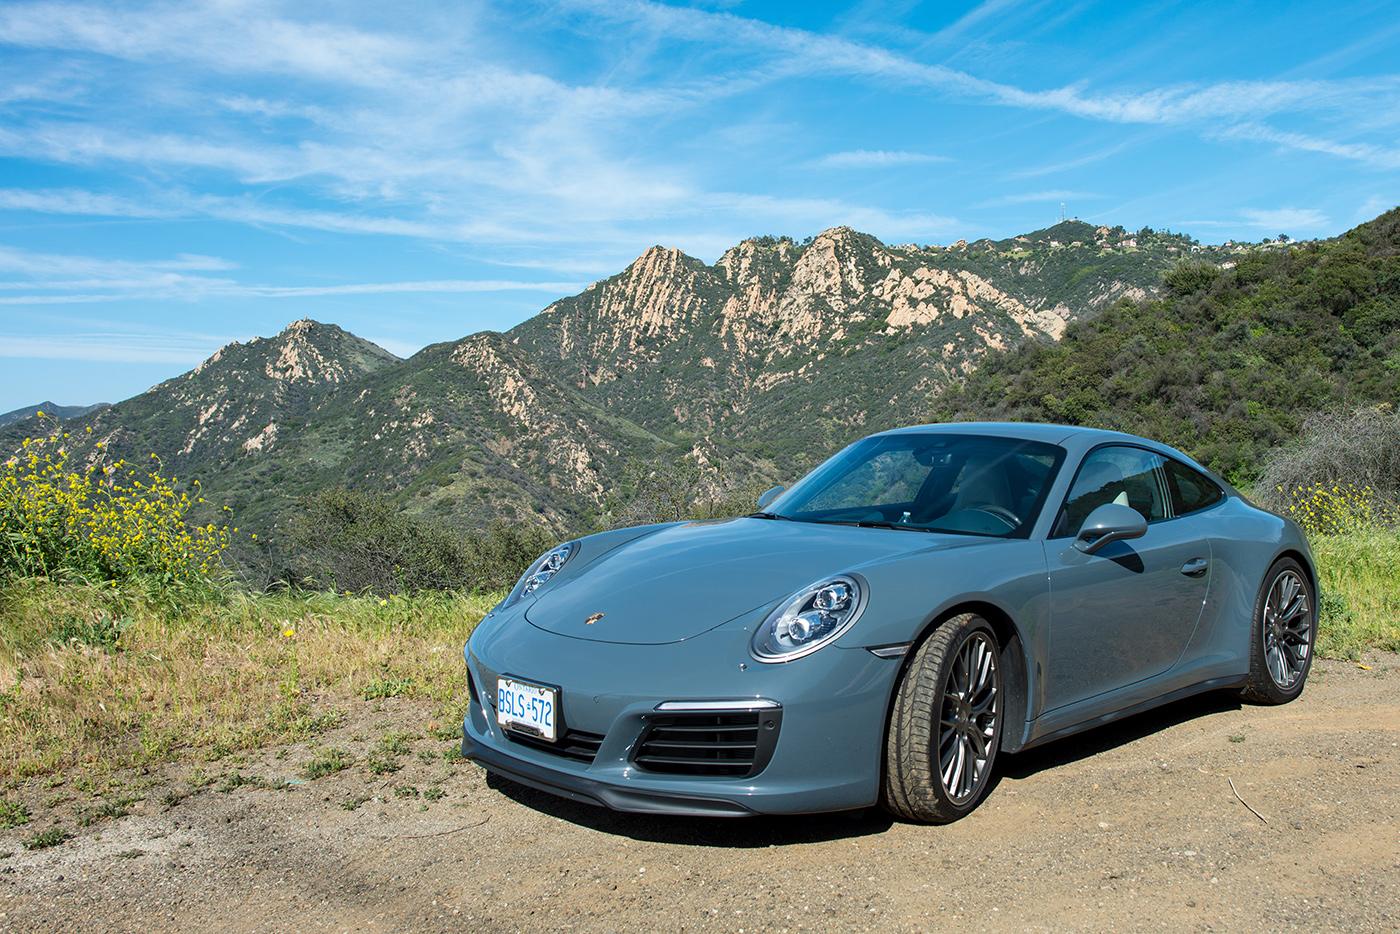 Toronto to L.A. in a Porsche 991.2 911 C4S - Actual Route